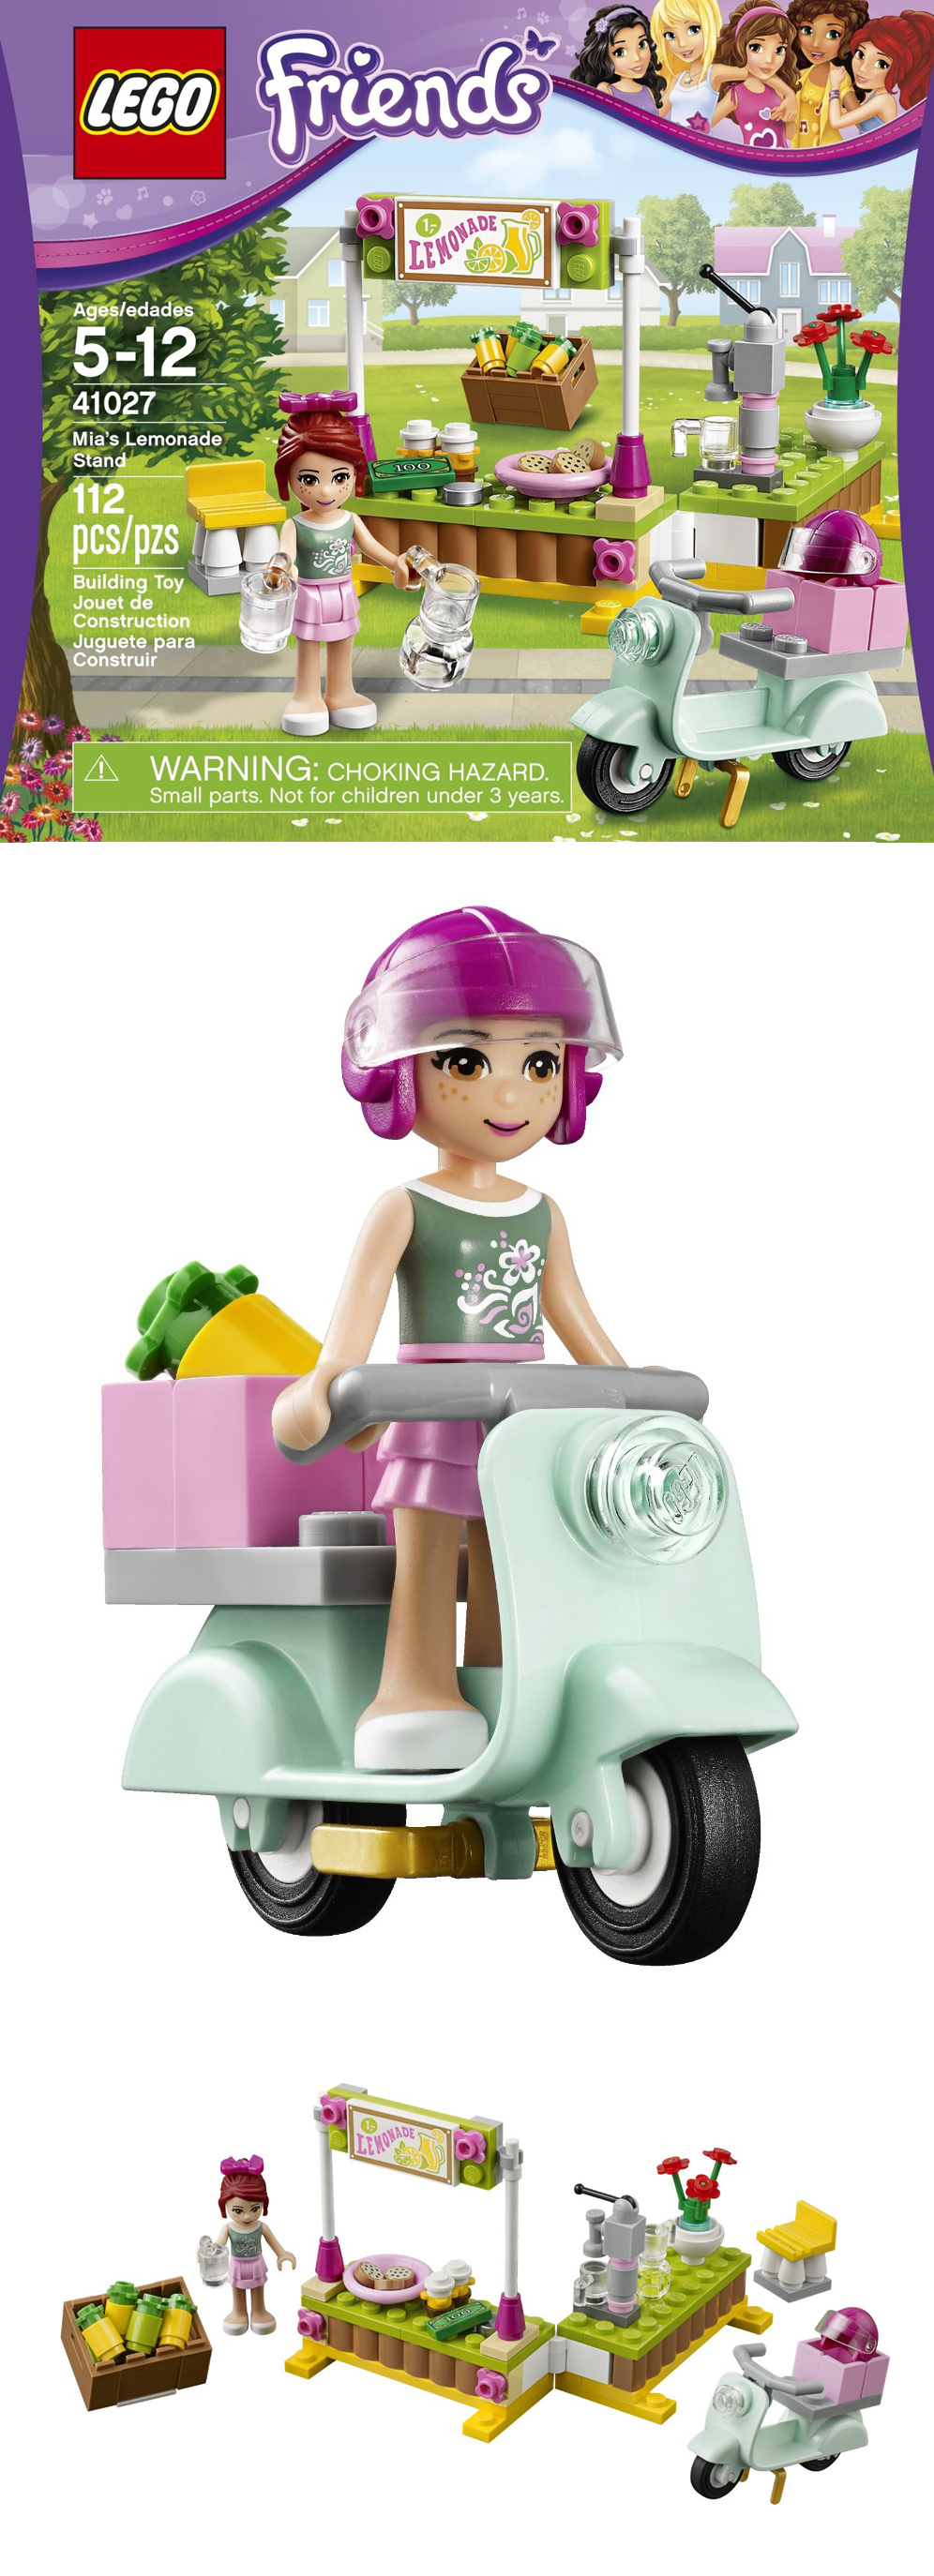 Mia's Lemonade Stand Legos Scooter Vespa